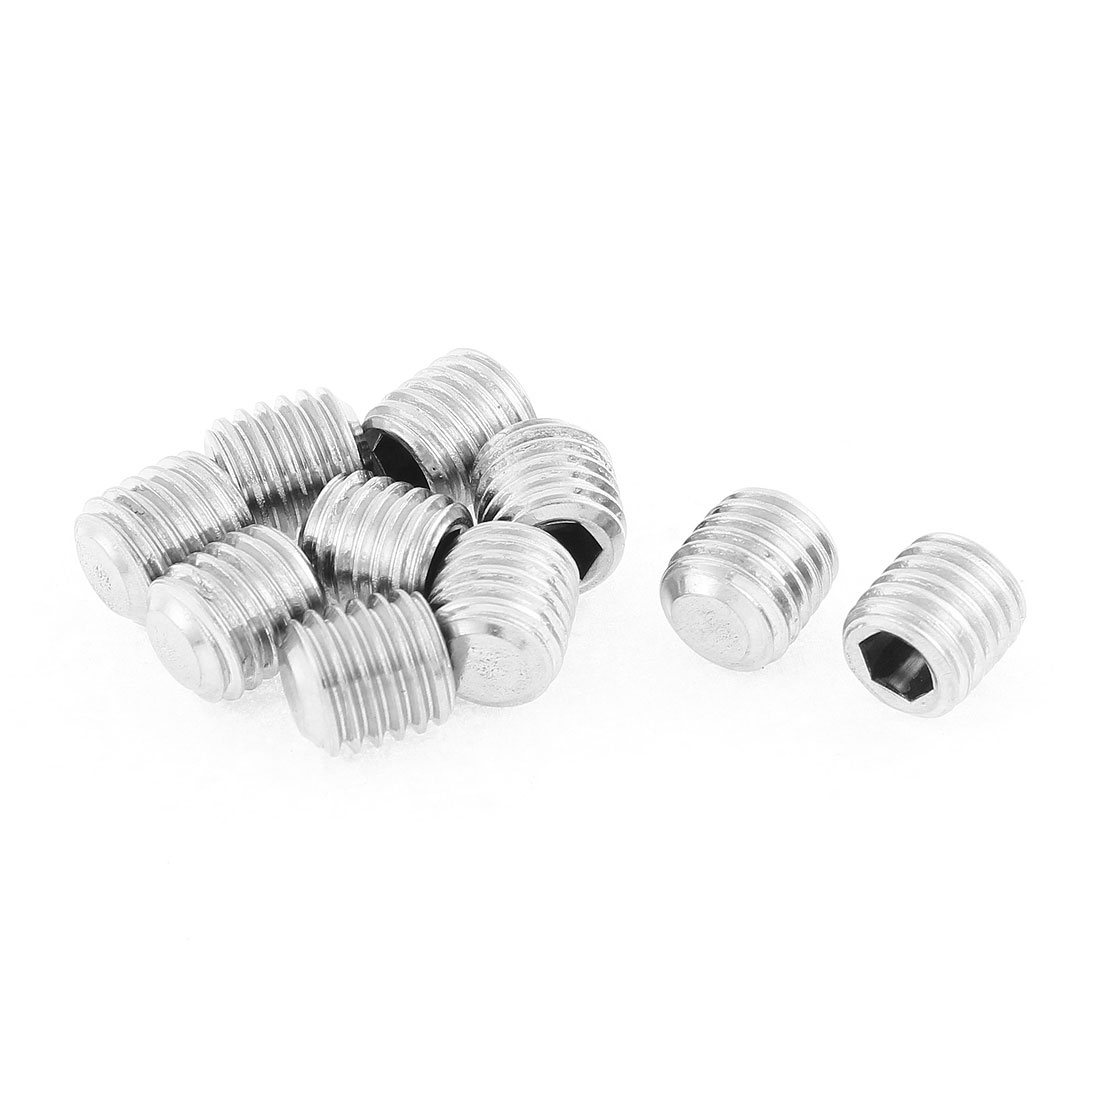 M12x12mm 1.75mm Pitch Stainless Steel Hex Socket Set Flat Point Grub Screws 10pcs